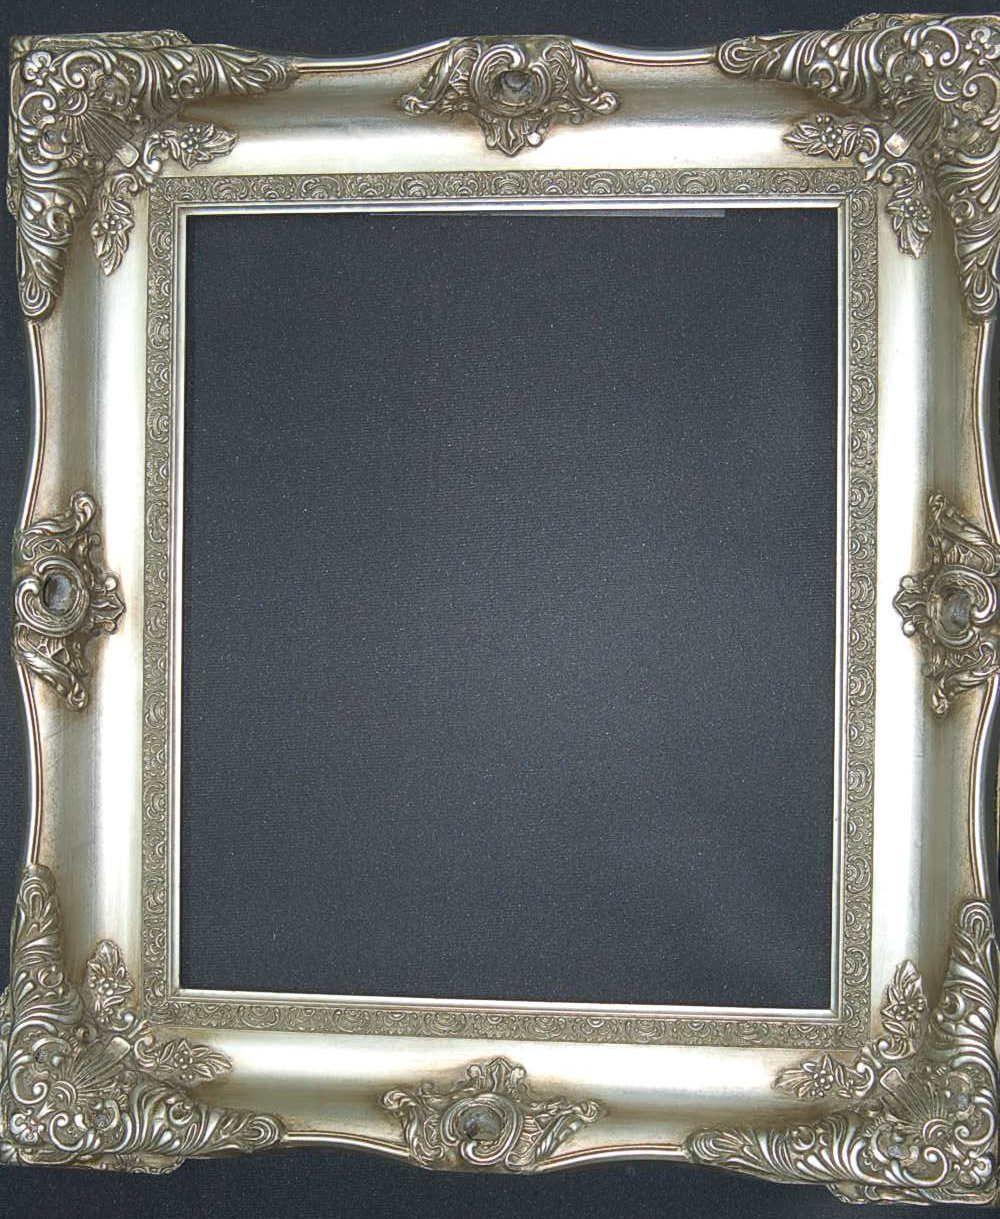 Seville Ornate Silver Picture Frame